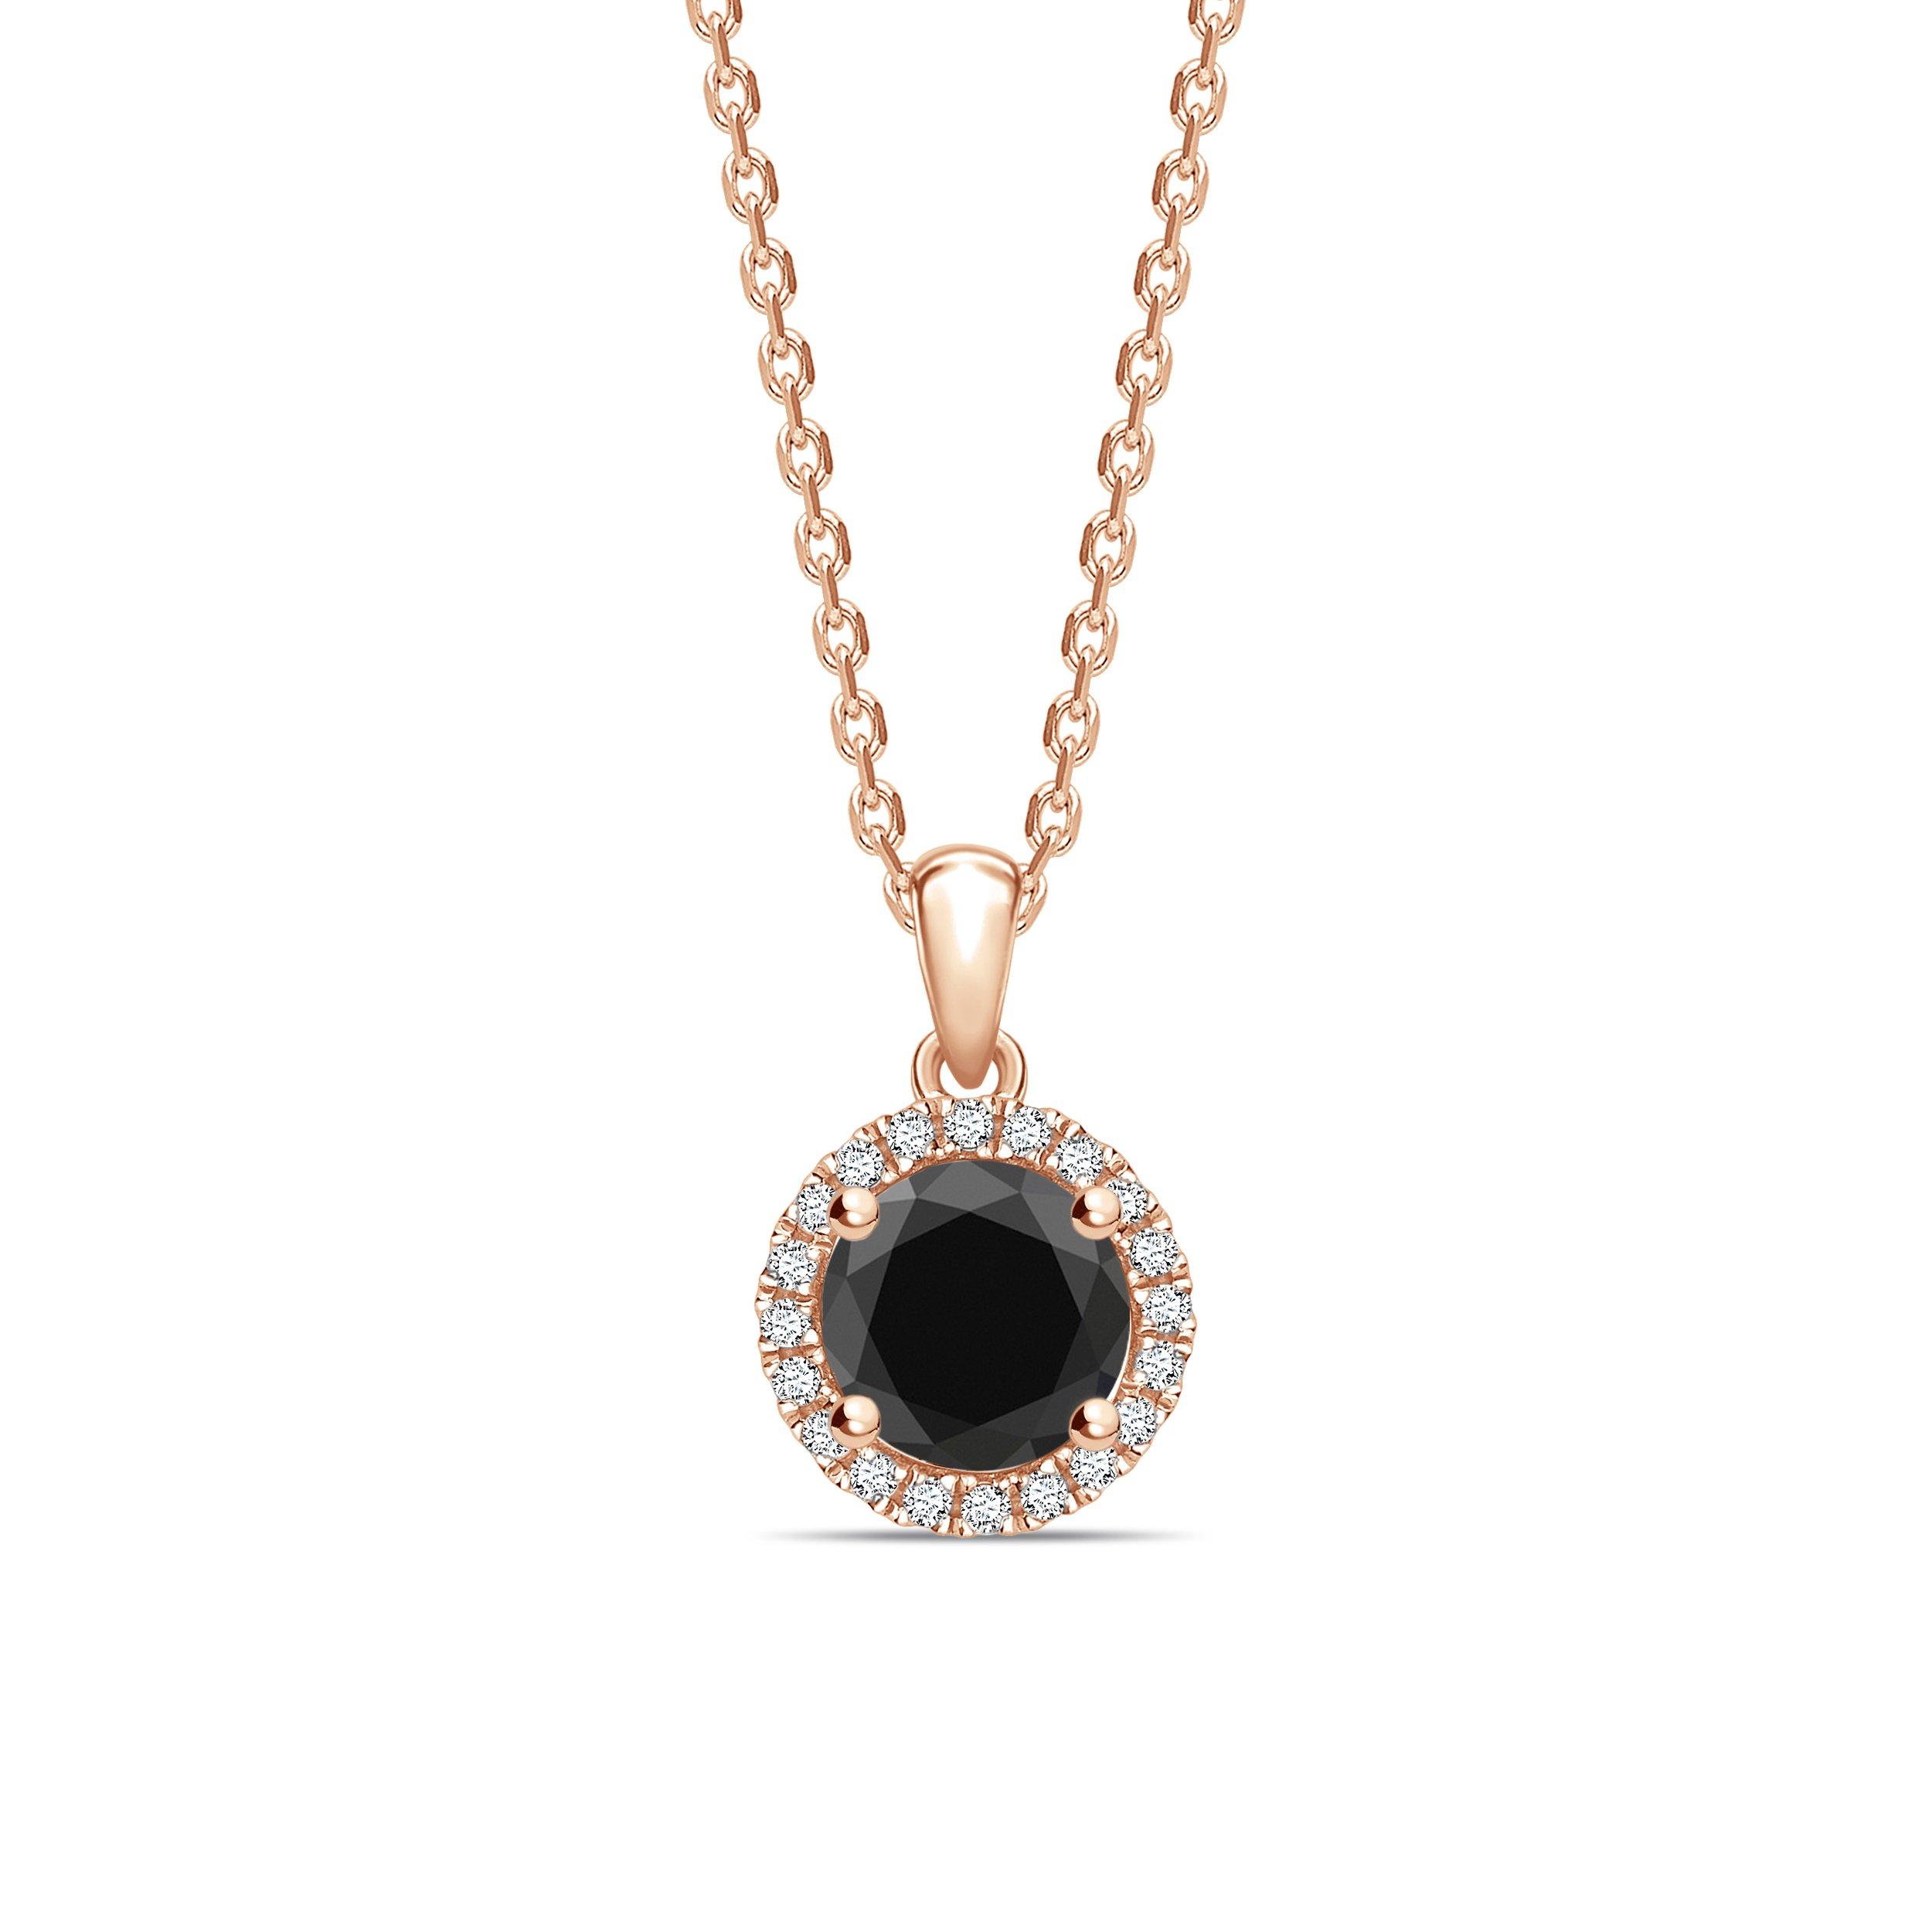 Halo Black Diamond Solitaire Pendants Necklace in Classic Round Cut